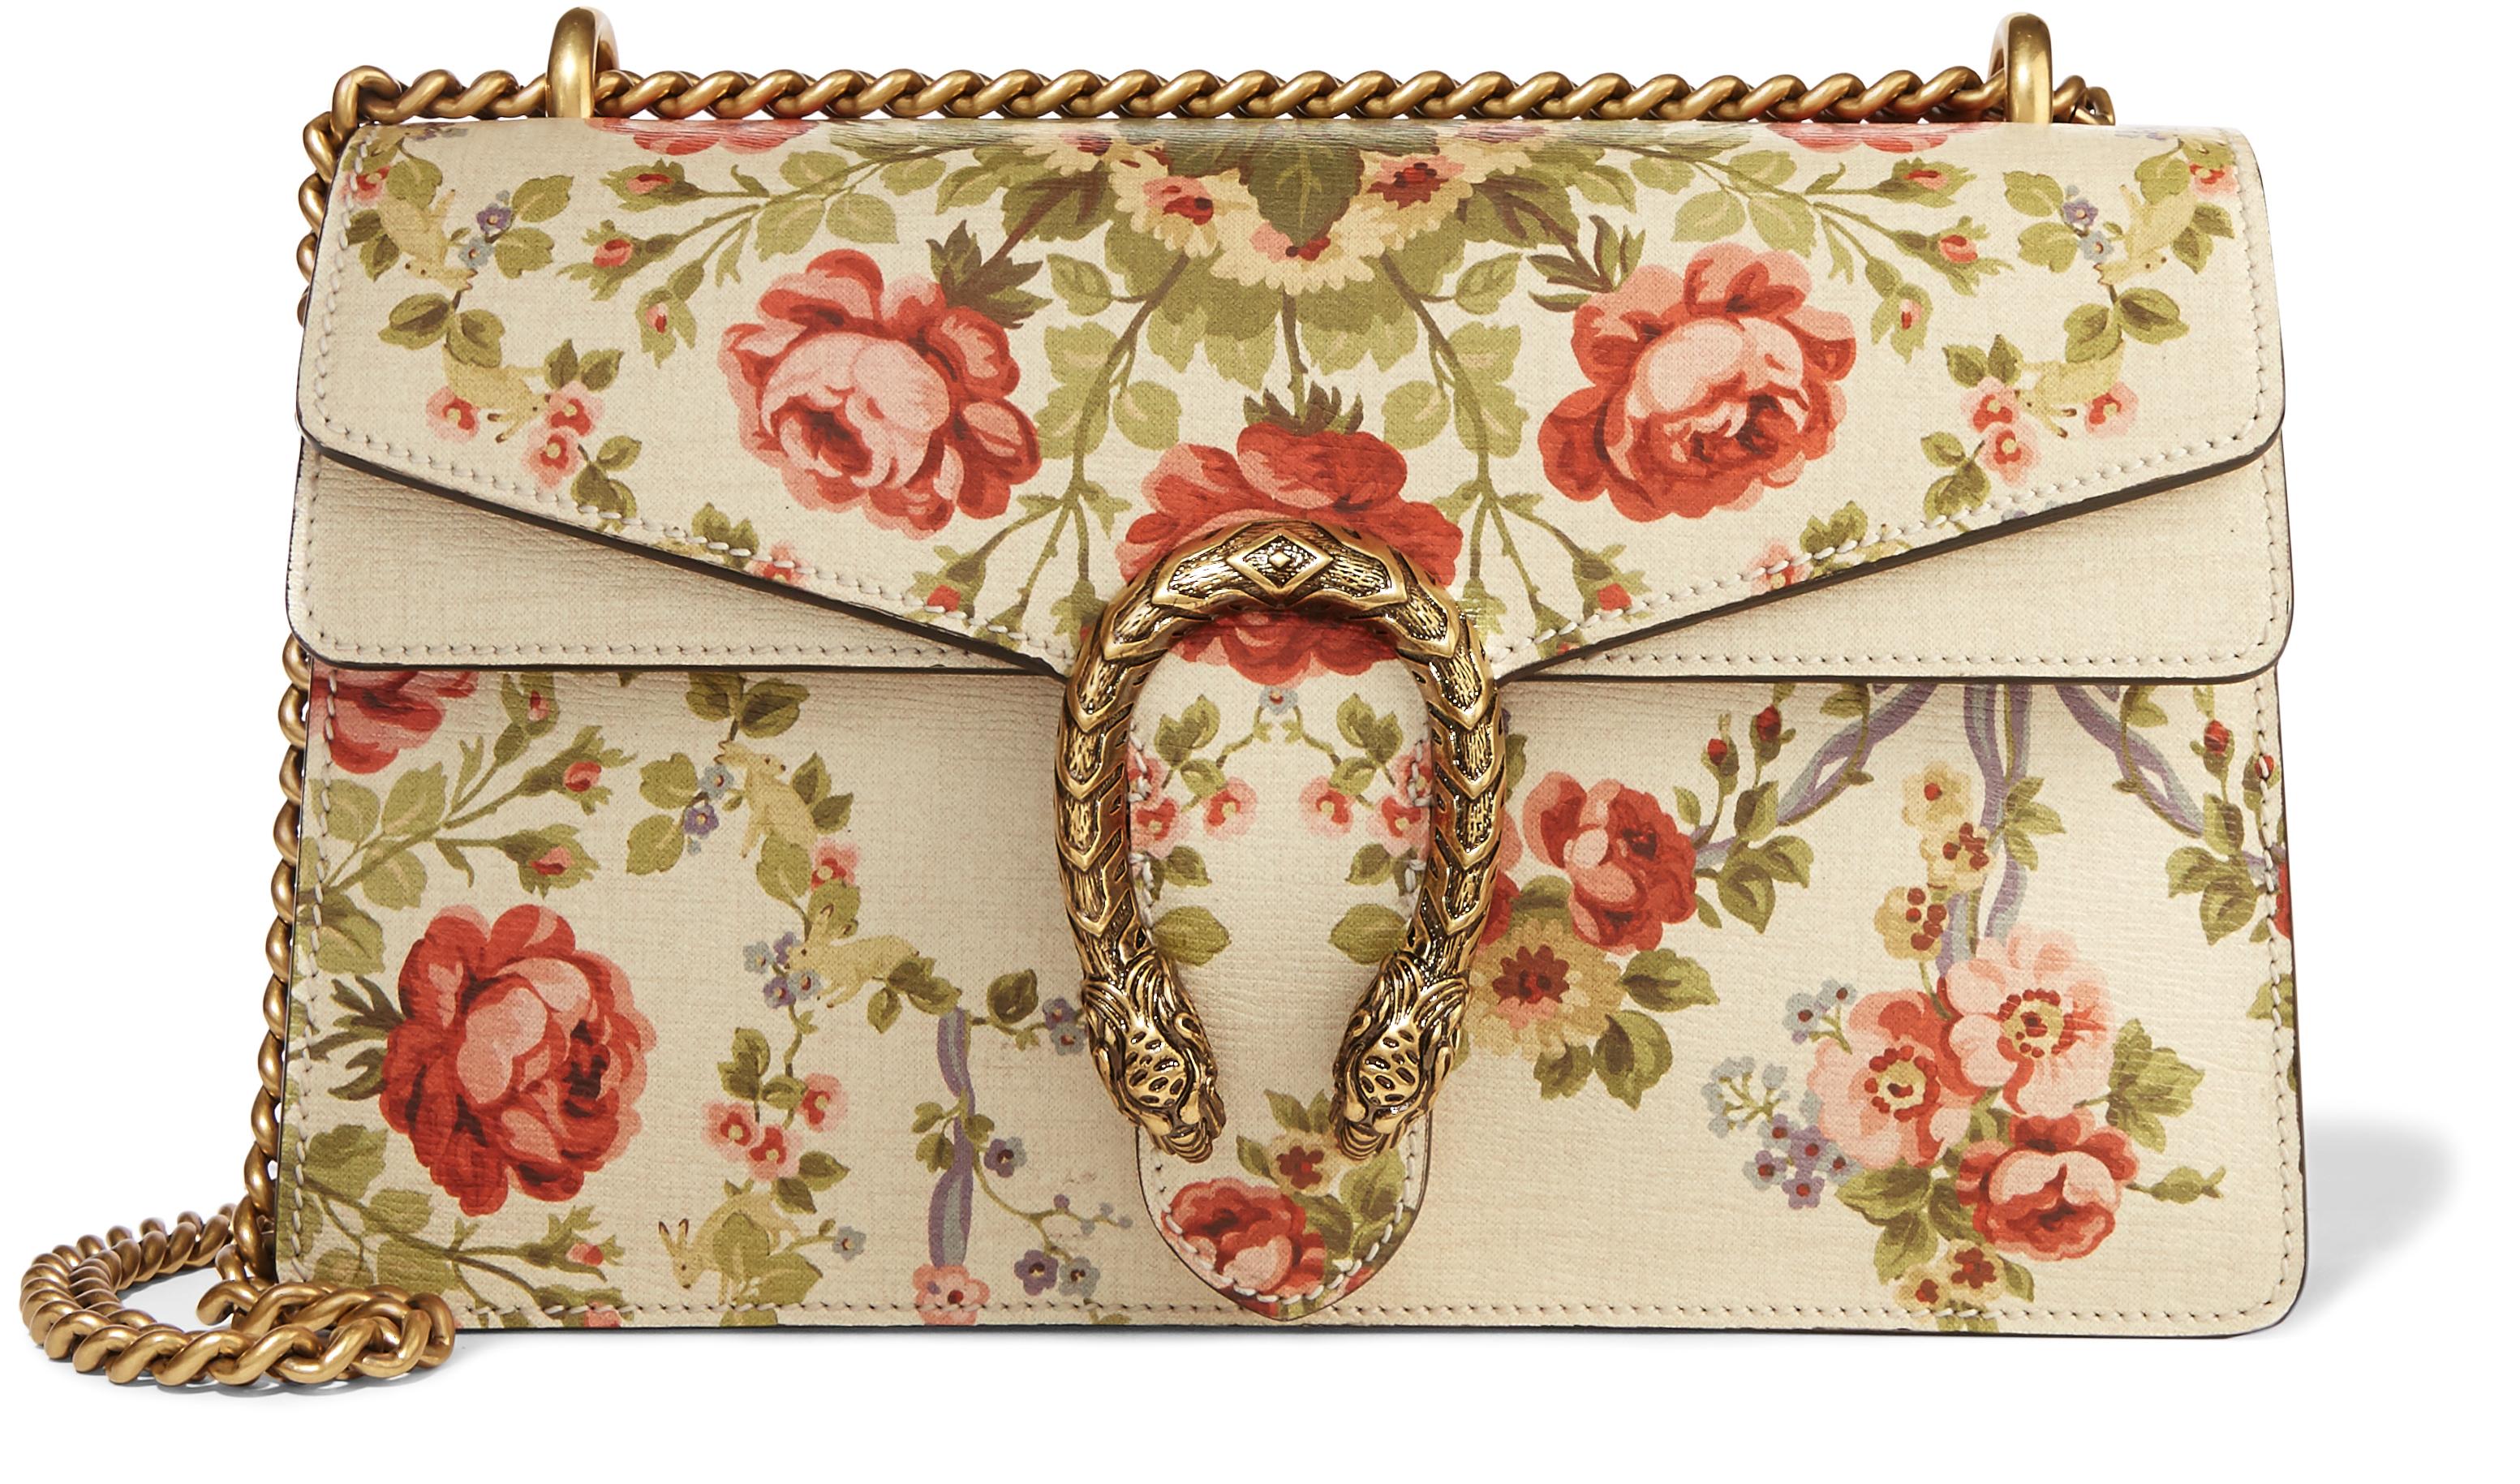 Gucci, Dionysus medium floral-print leather shoulder bag, $2,490 ...